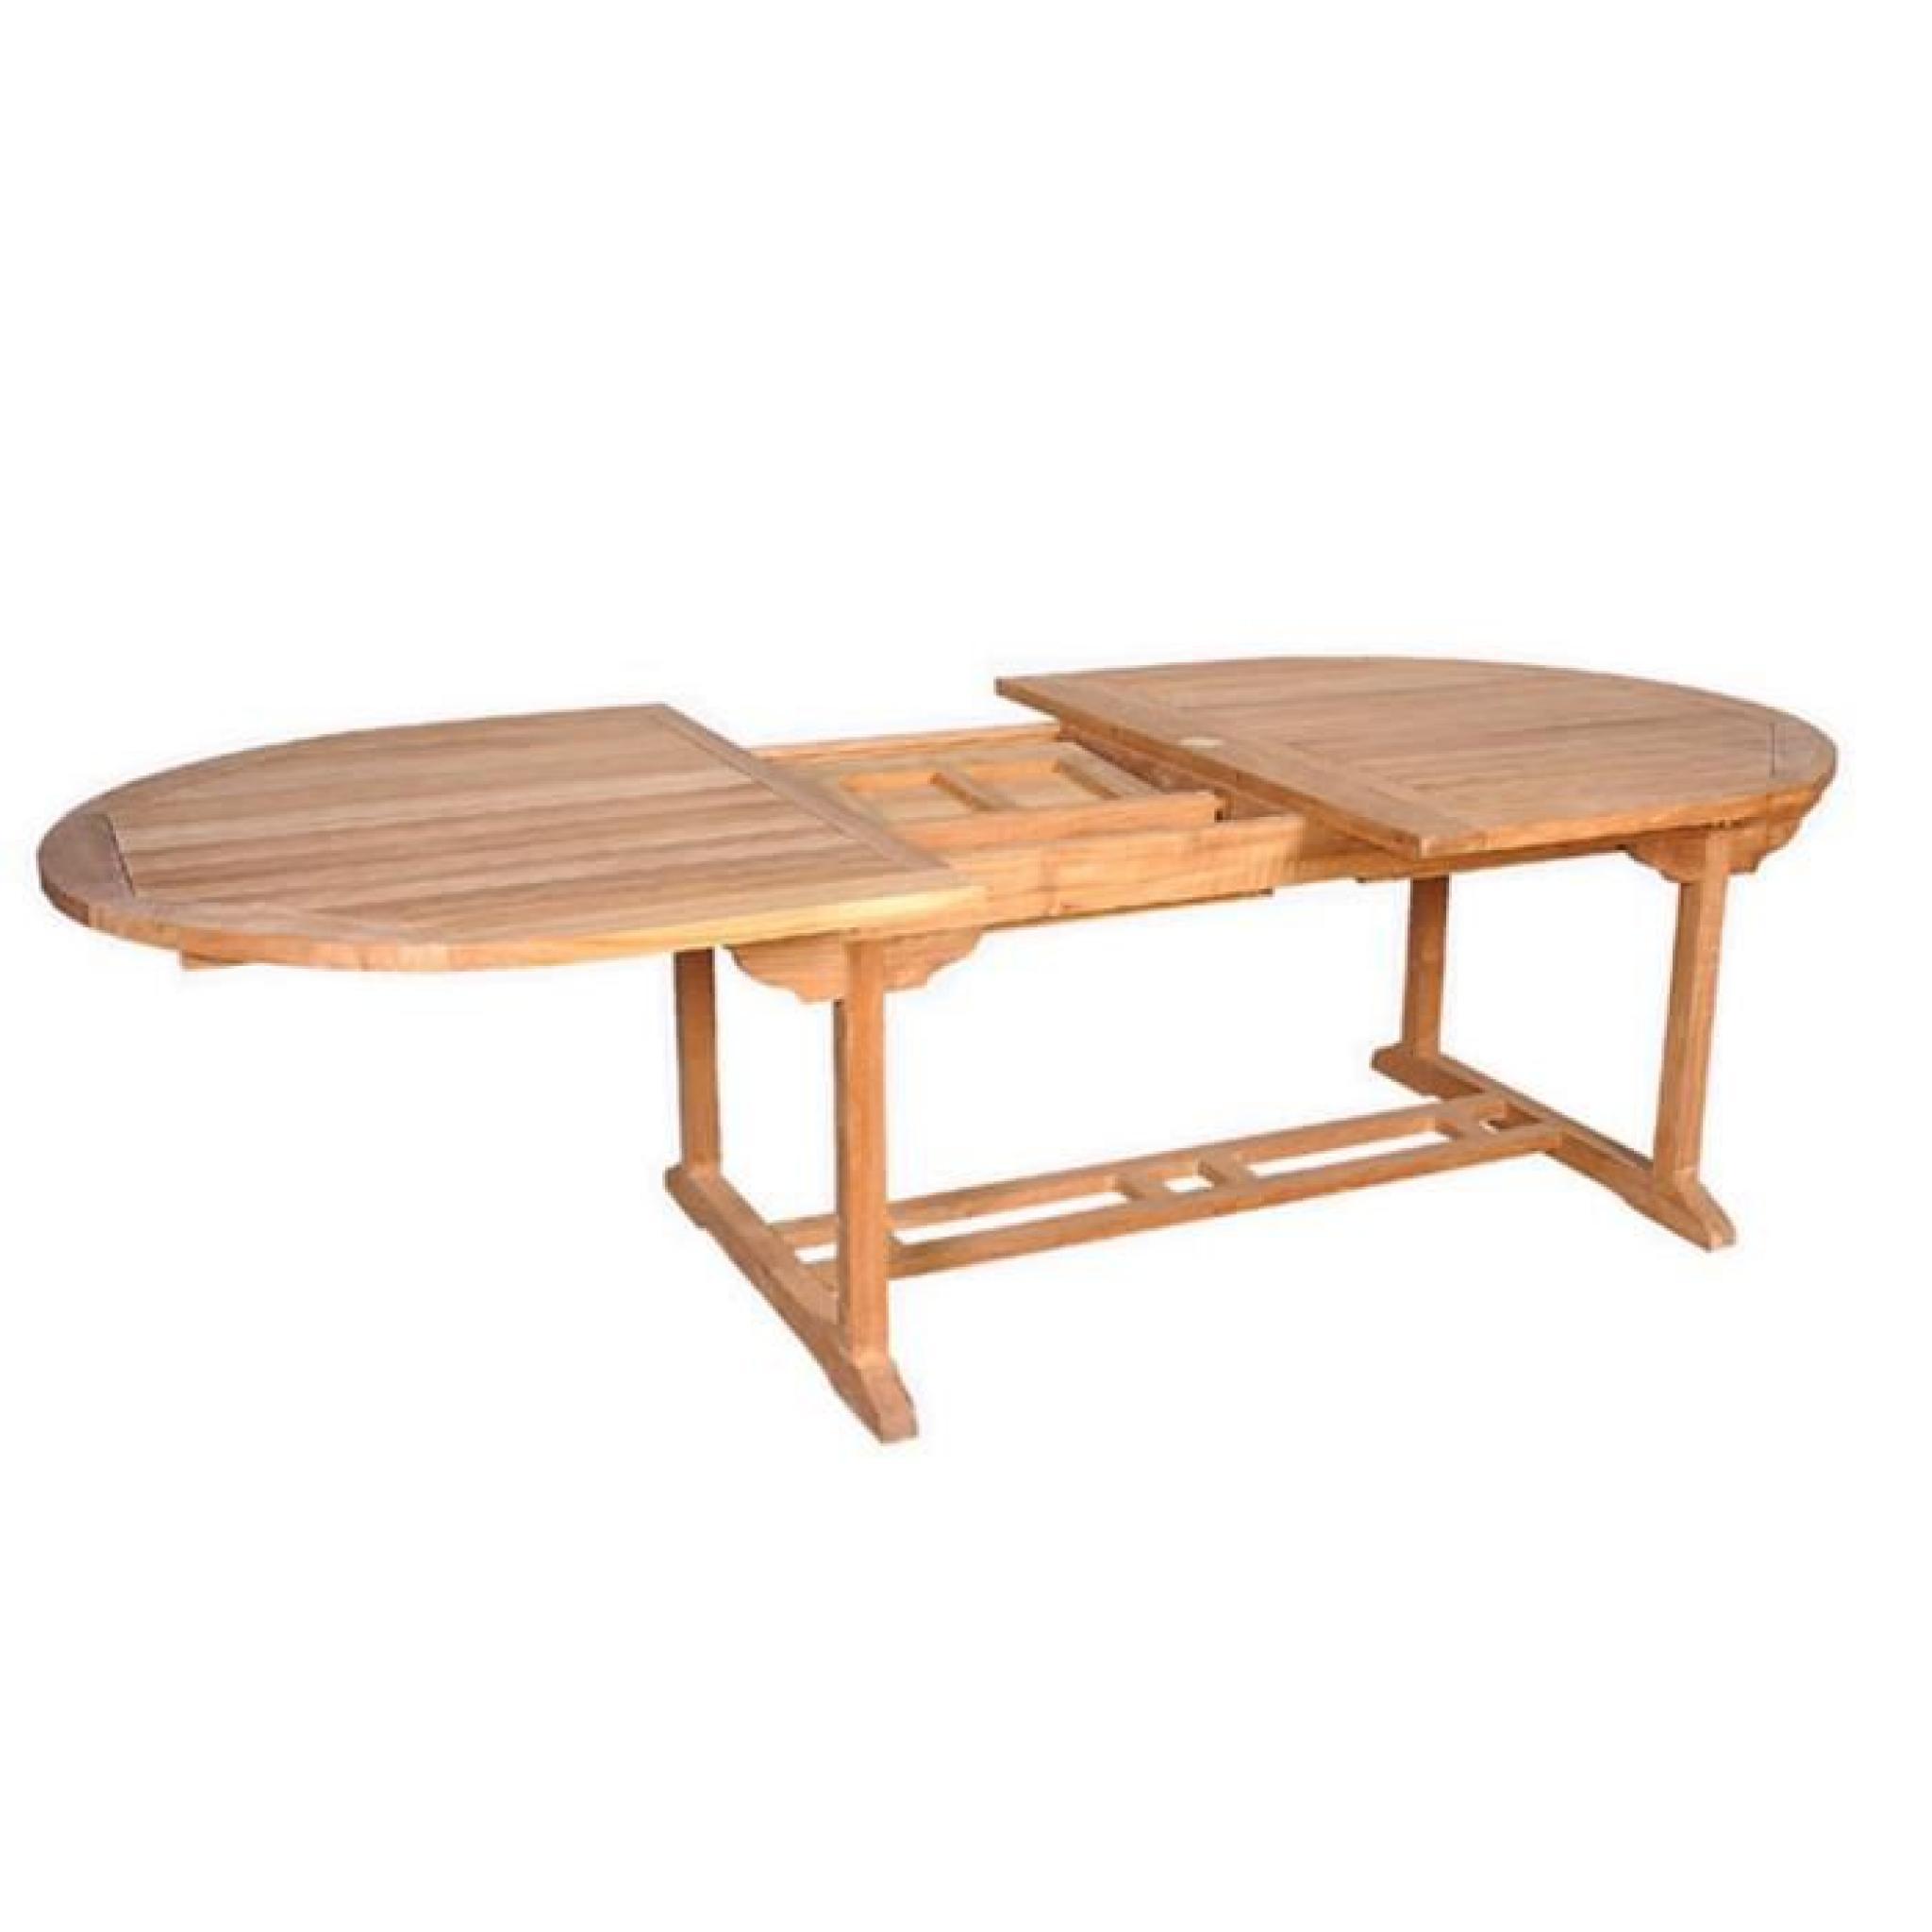 Salon Jardin Teck Brut | Table Teck Exterieur Beautiful Table Teck ...